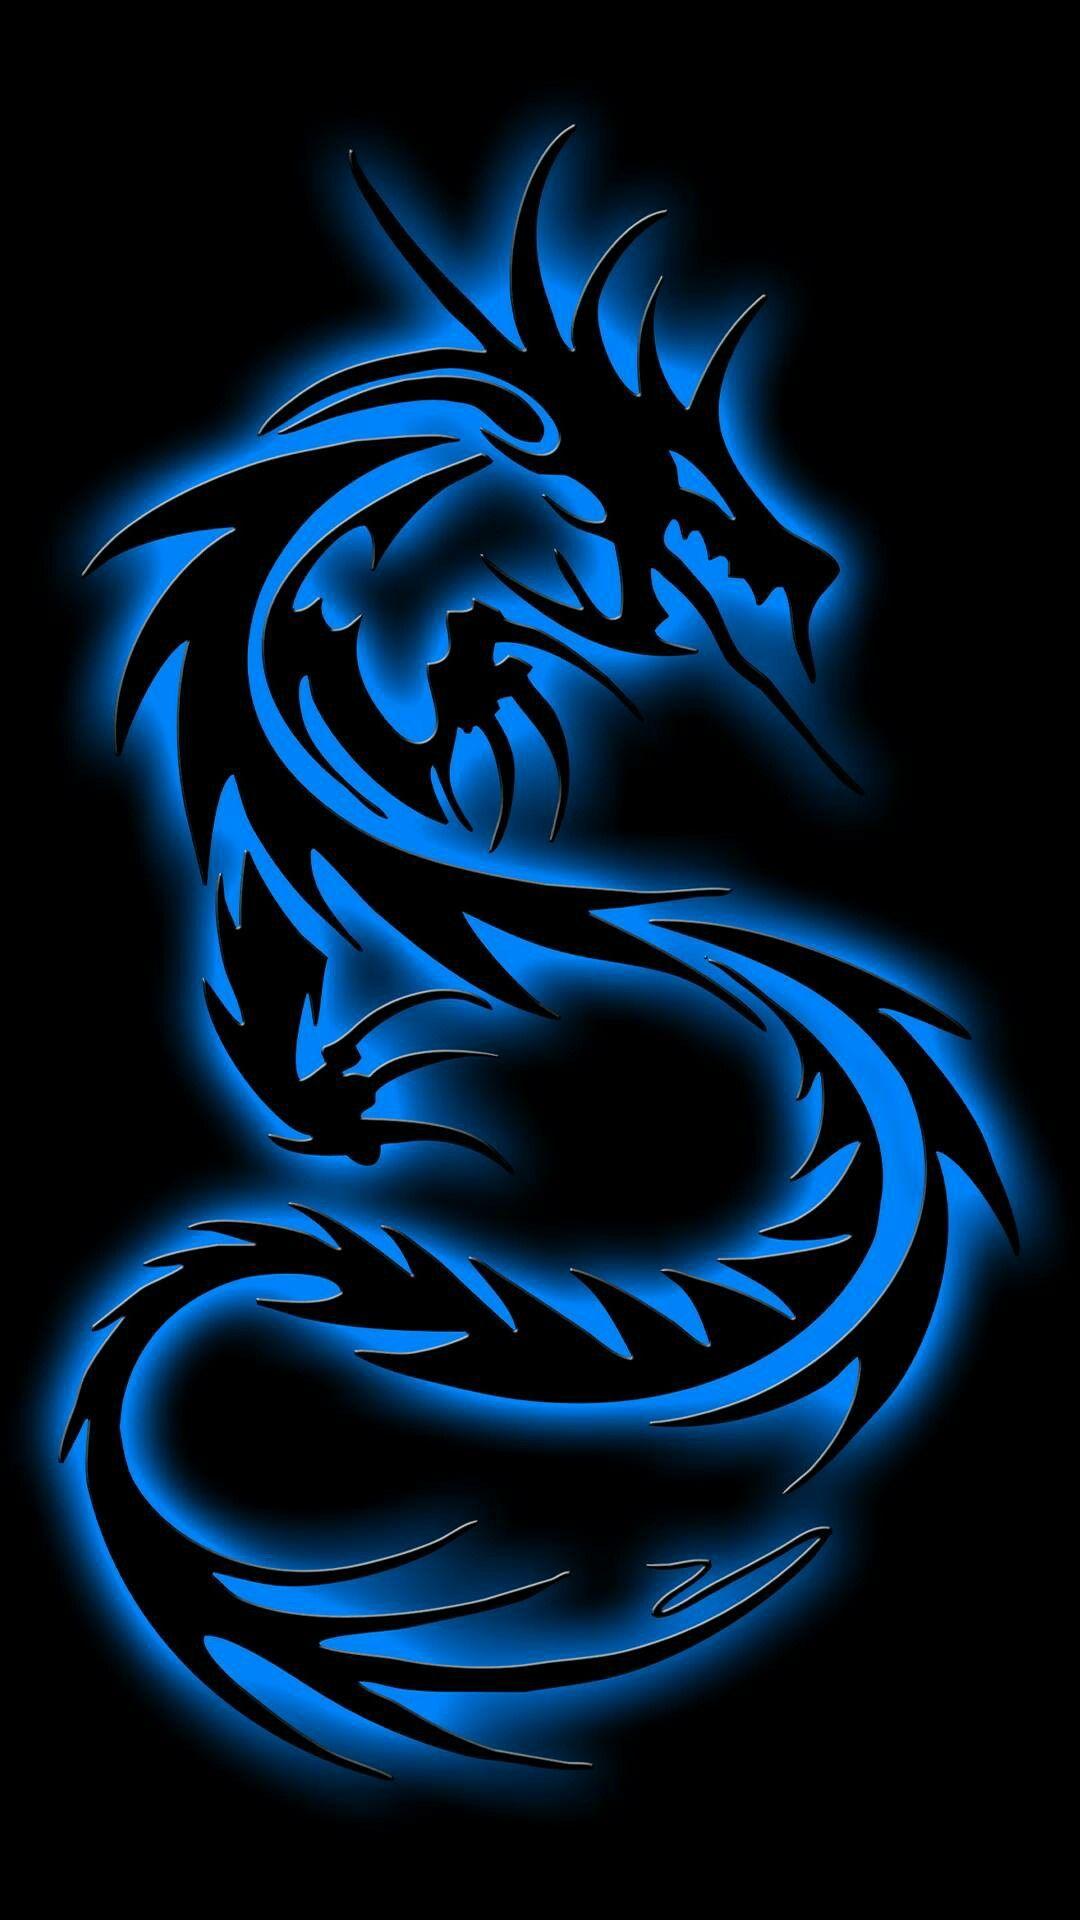 Dragon Tattoo Mobile Wallpaper